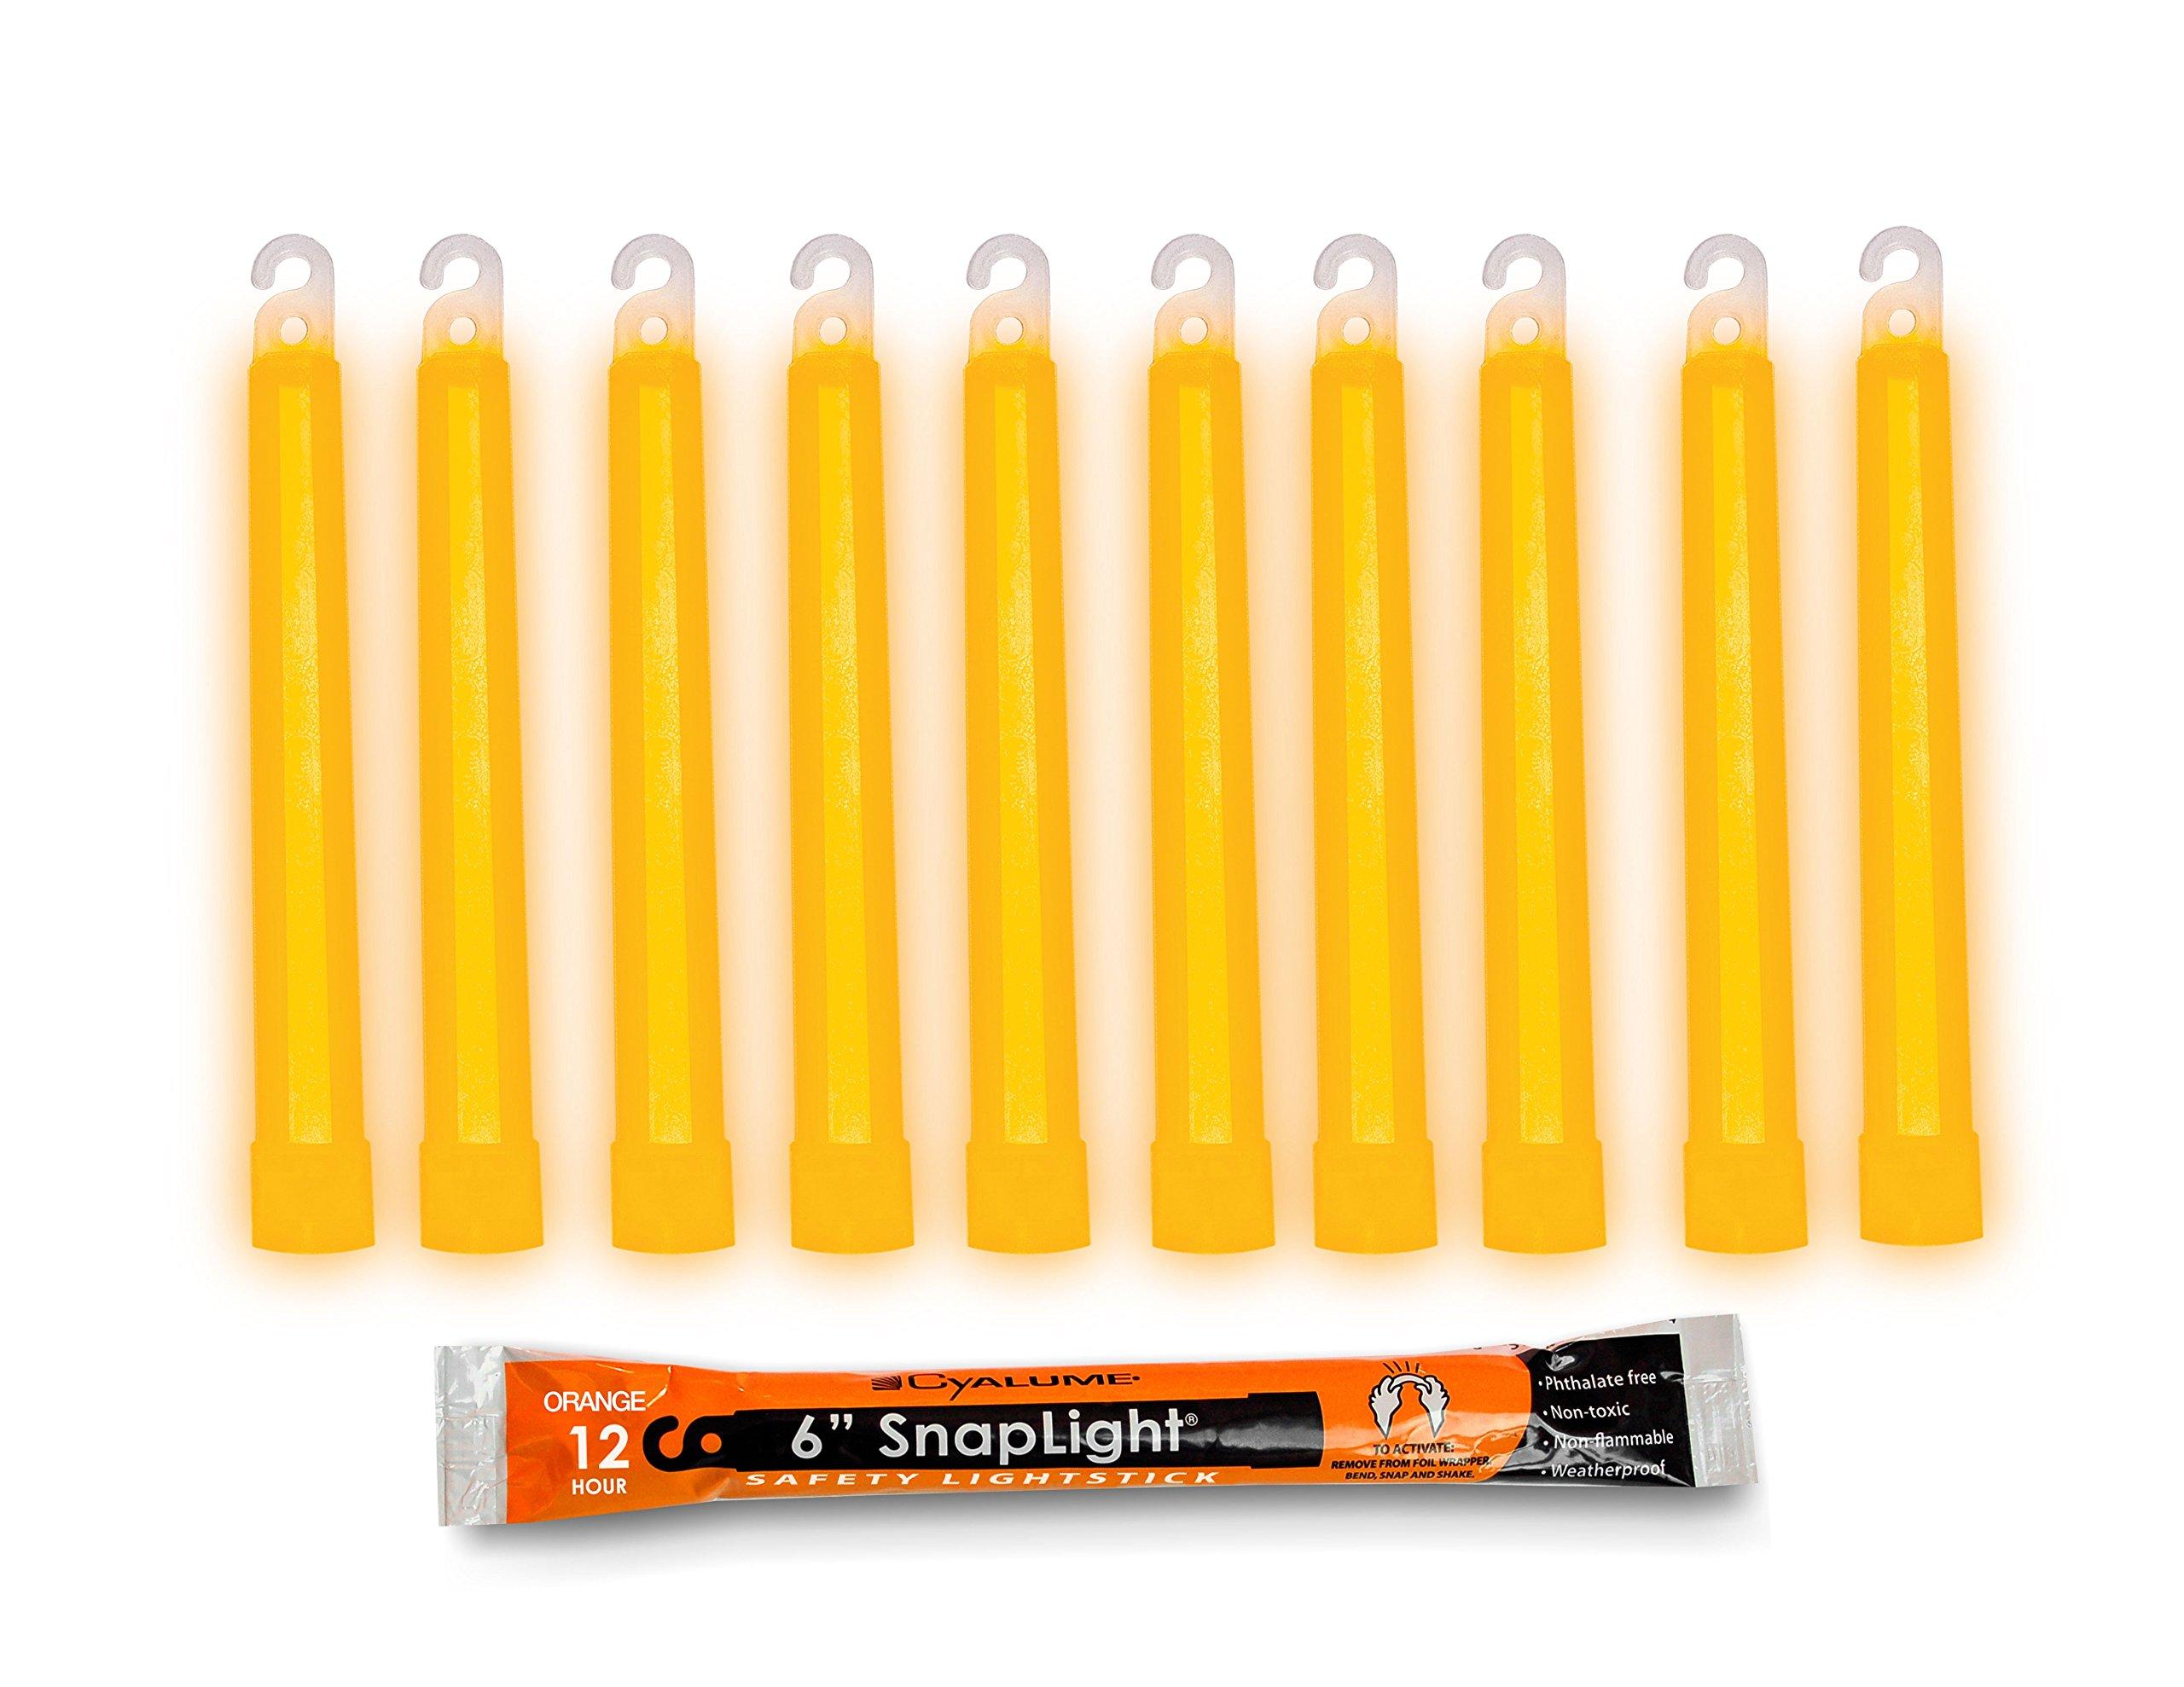 Cyalume SnapLight Orange Glow Sticks – 6 Inch Industrial Grade, Ultra Bright Light Sticks with 12 Hour Duration (Pack of 10)